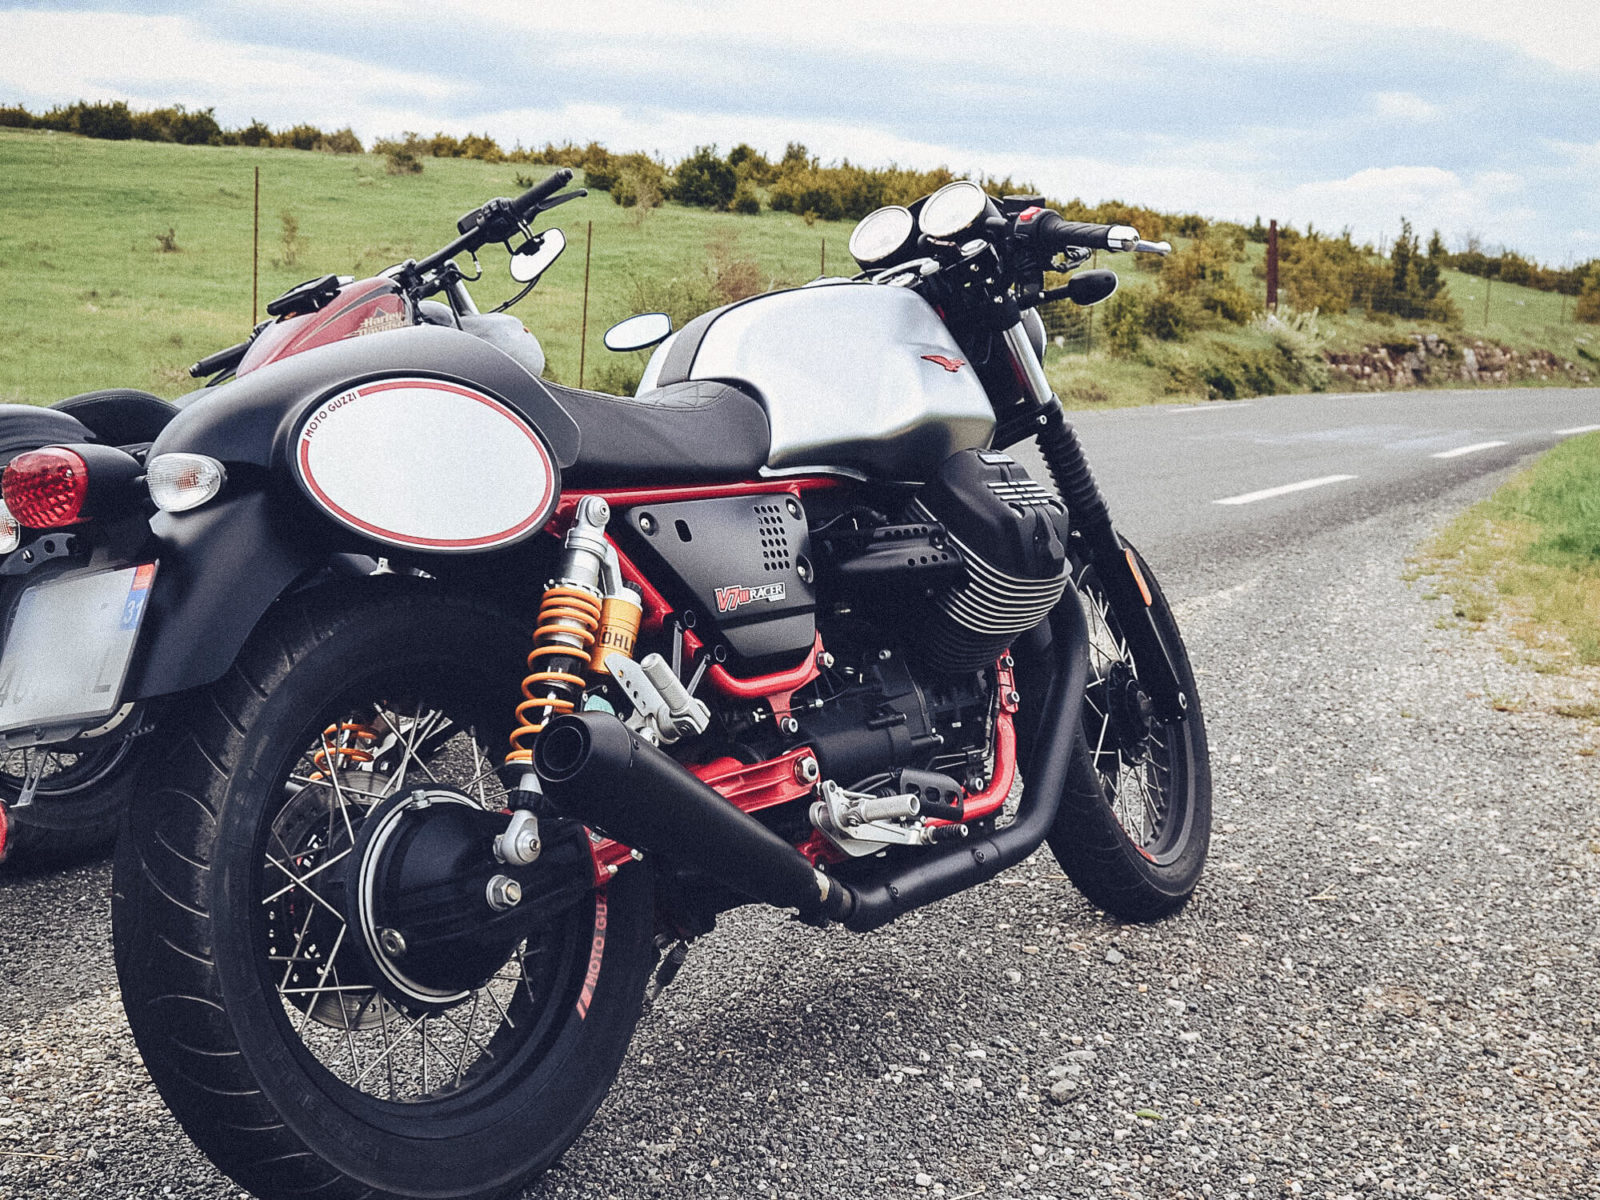 Moto Guzzi V7 3 III iii racer test avis prix comparatif